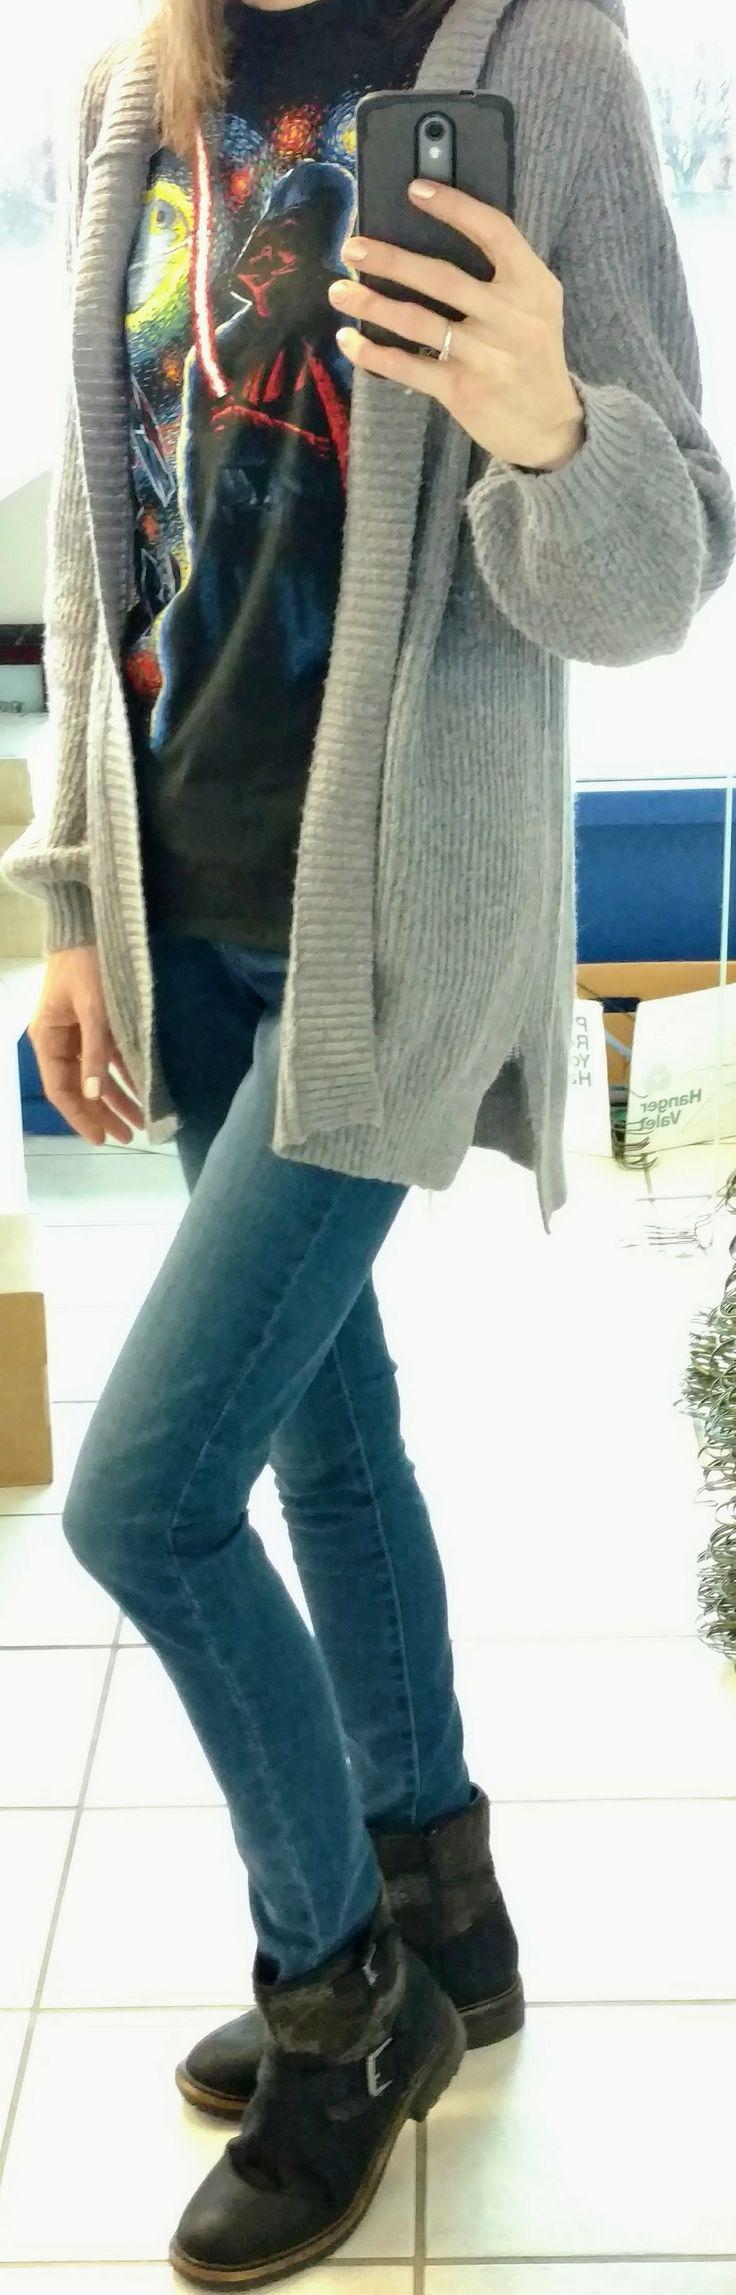 Star Wars shirt, Mudd bishop sleeve cardigan, Levi's Slimming Skinny jeans, Sonoma boots